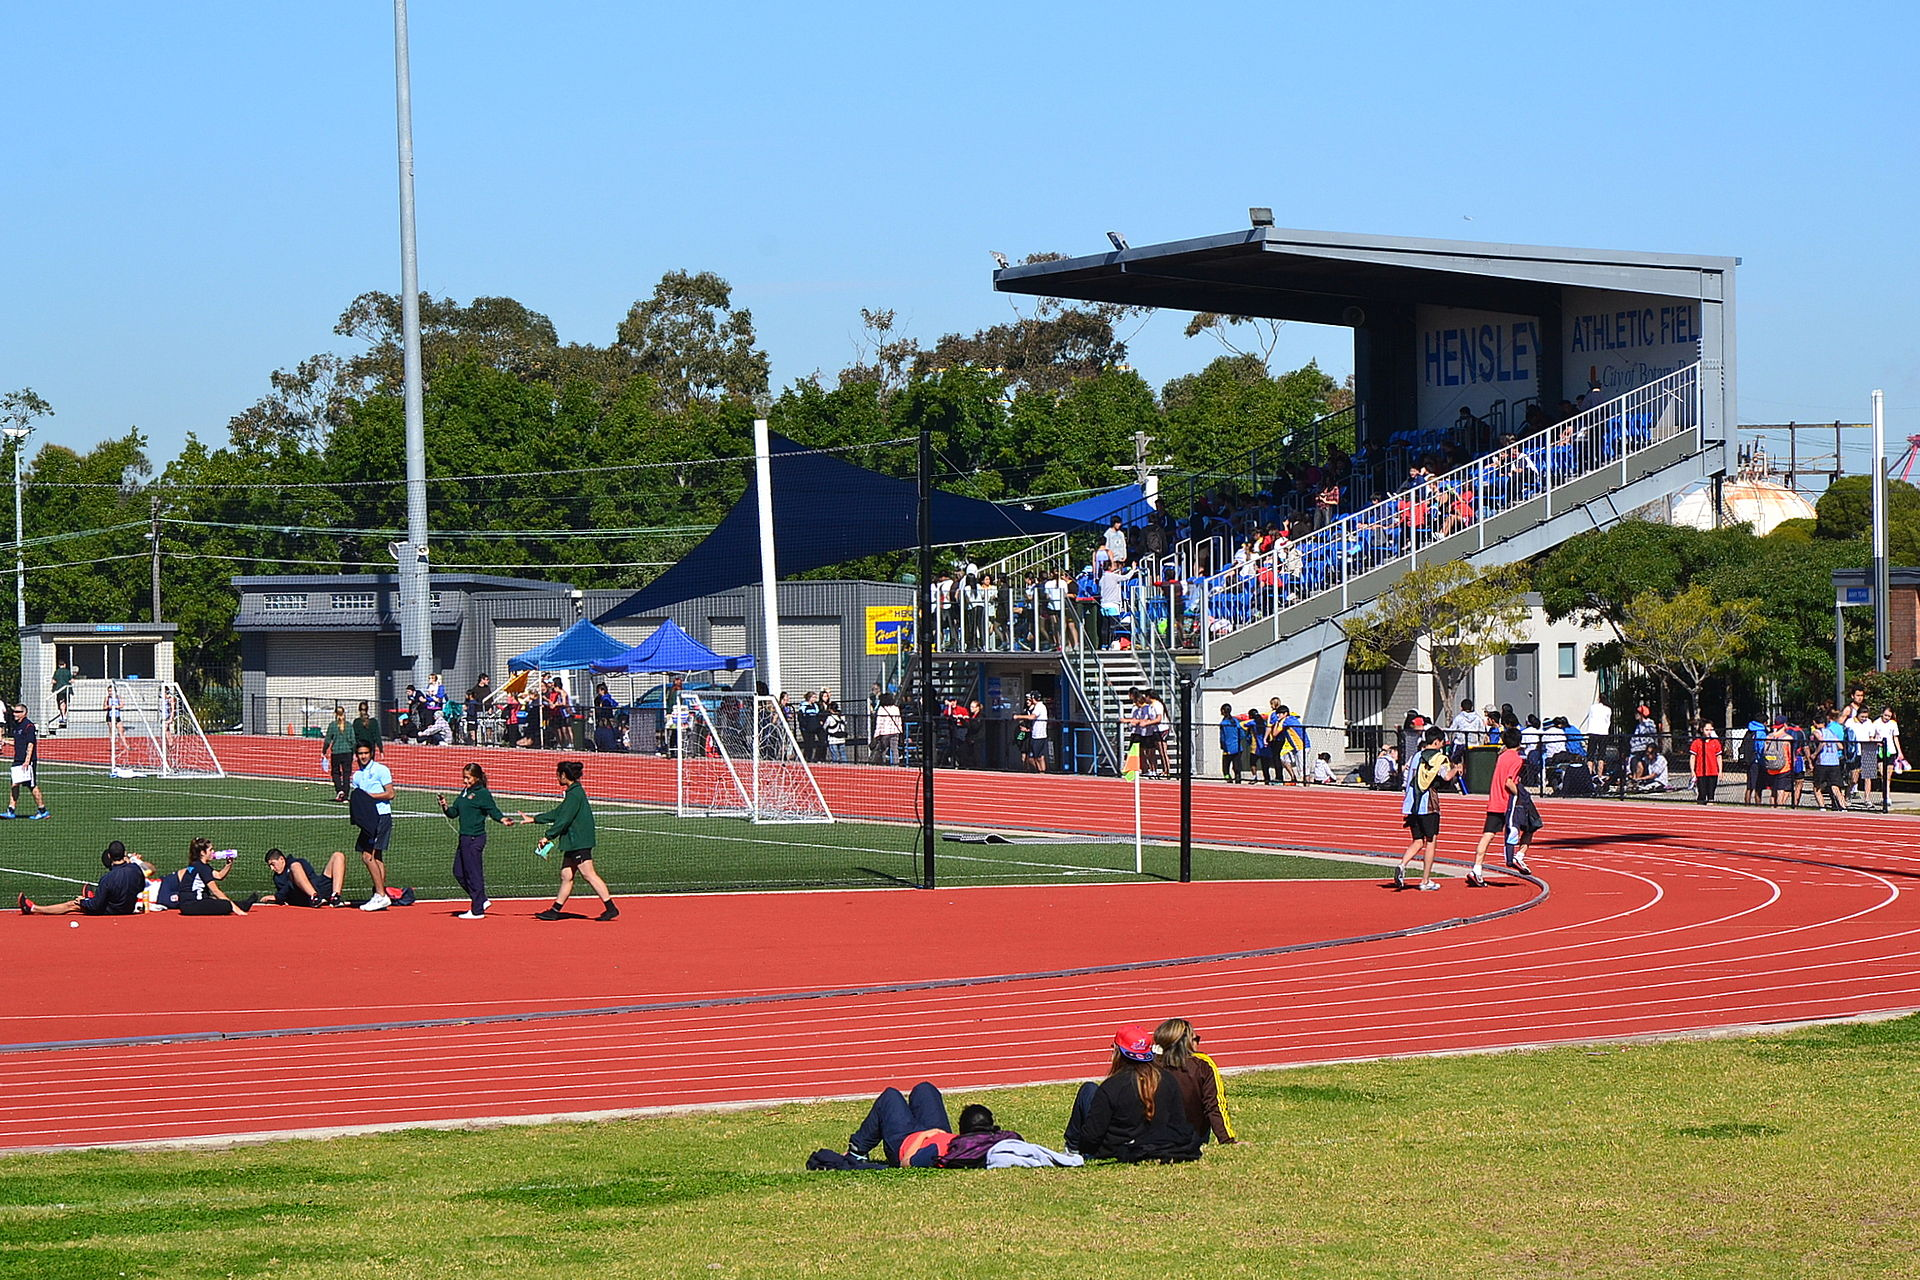 Hensley Athletic Field Wikipedia